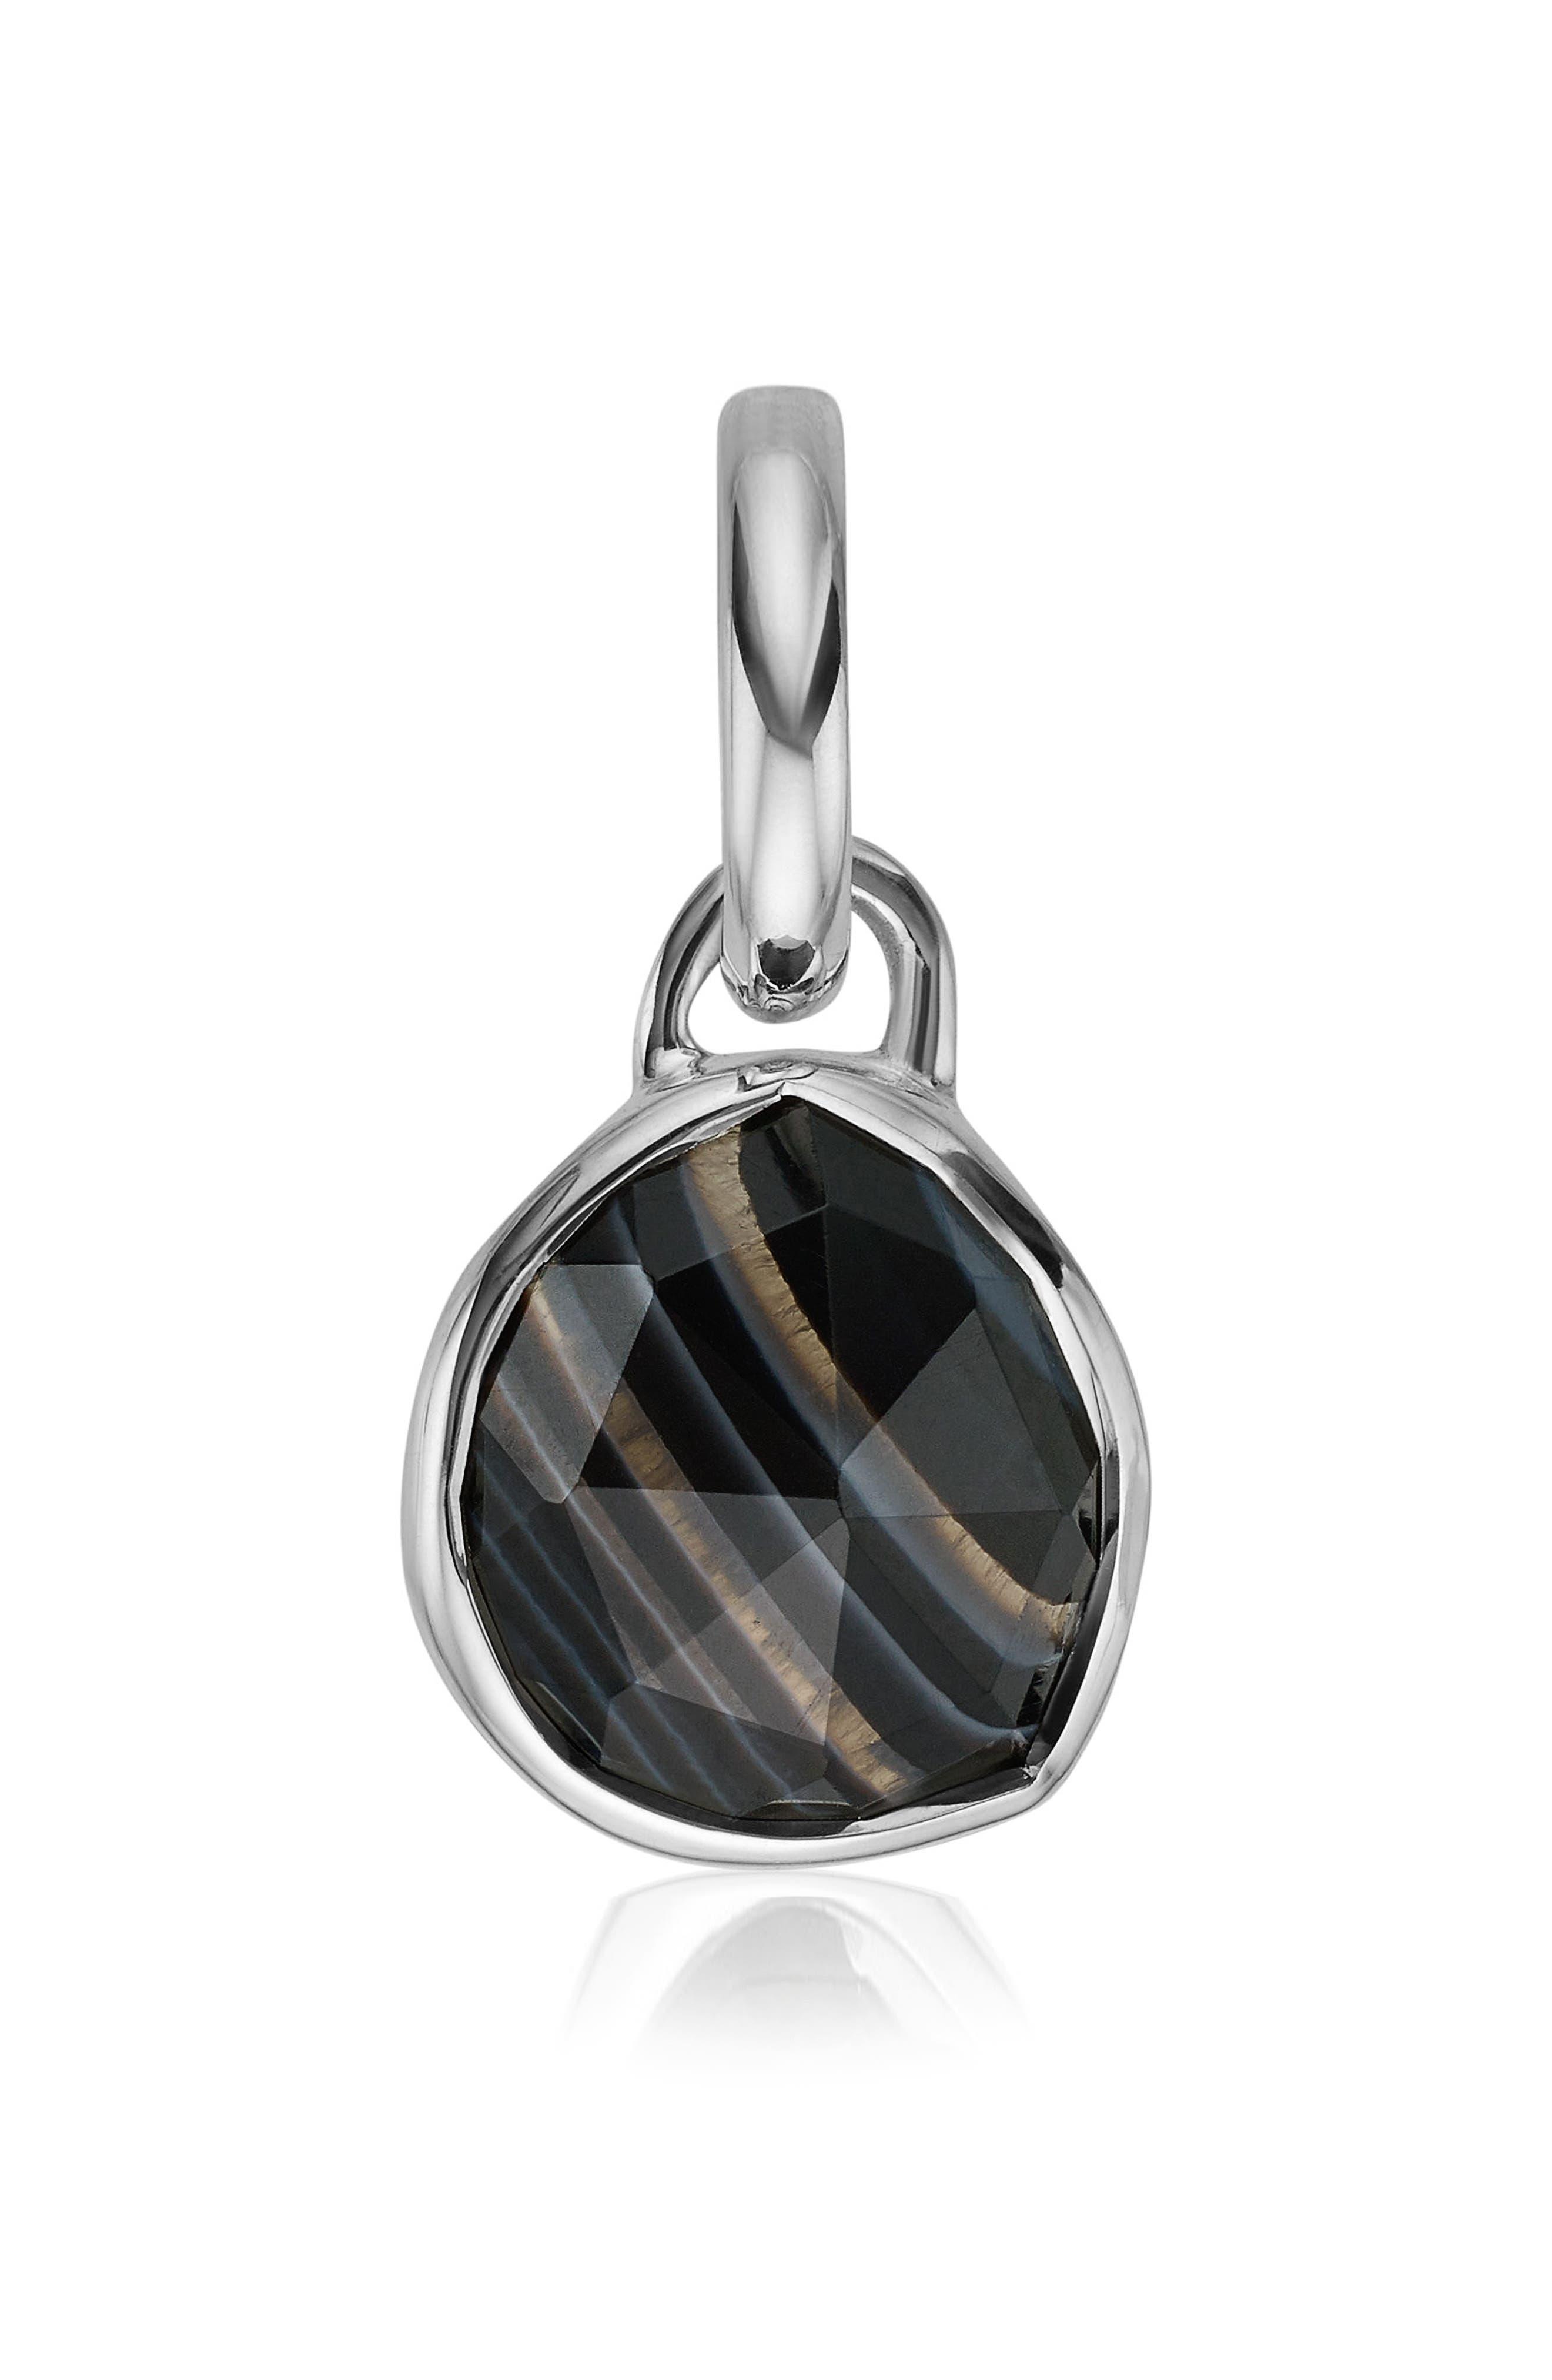 Siren Black Line Onyx Pendant,                         Main,                         color, Silver/ Black Line Onyx